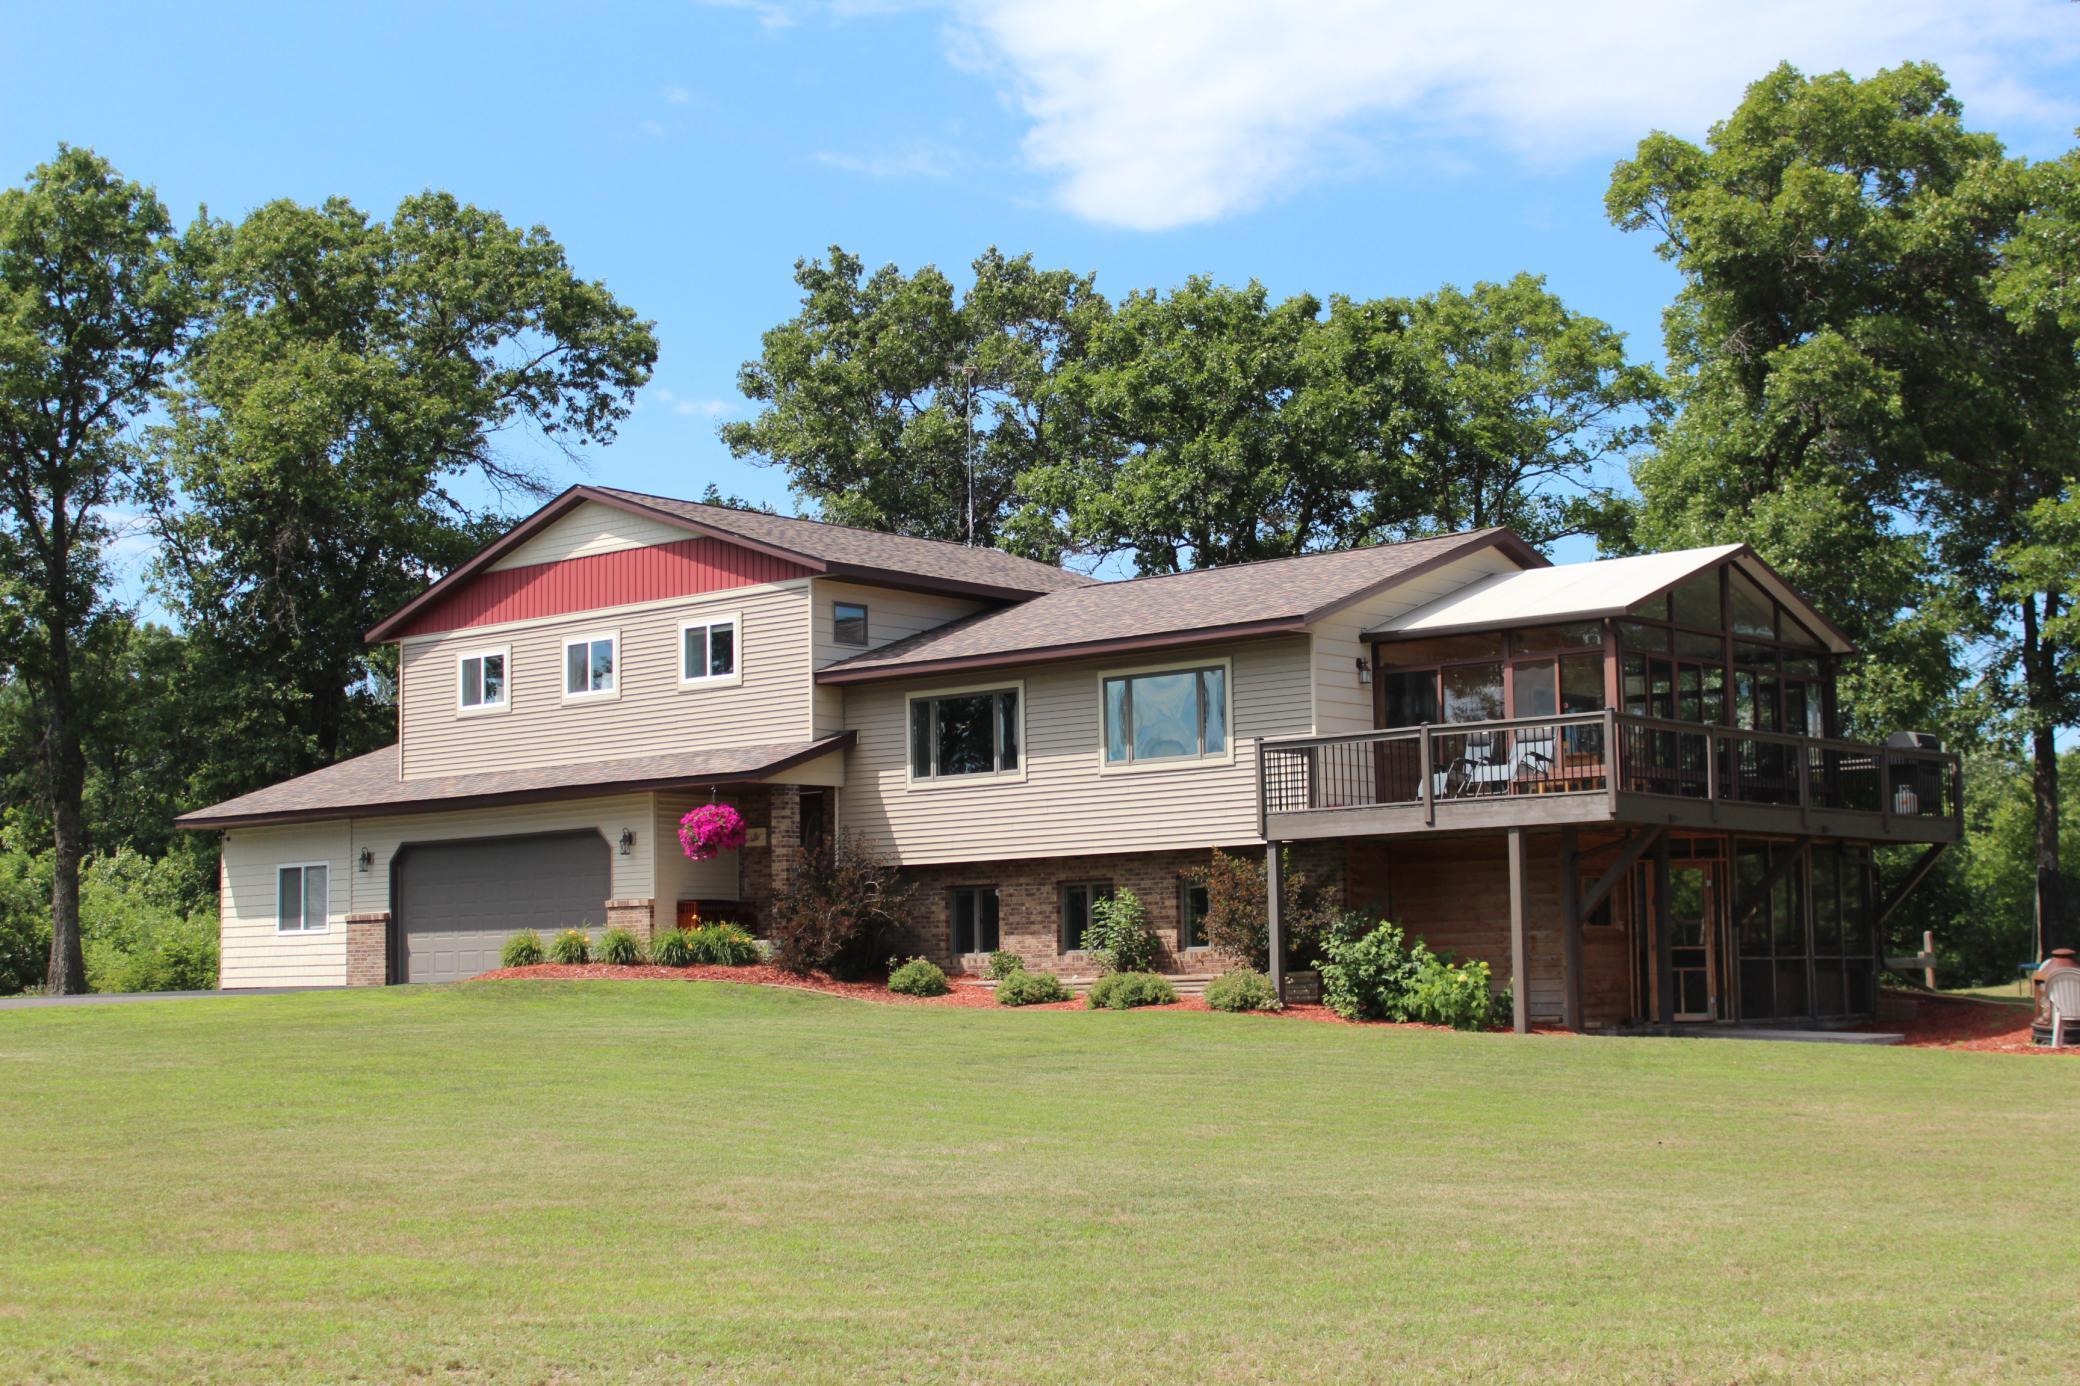 23094 Thorson Property Photo - Grantsburg, WI real estate listing